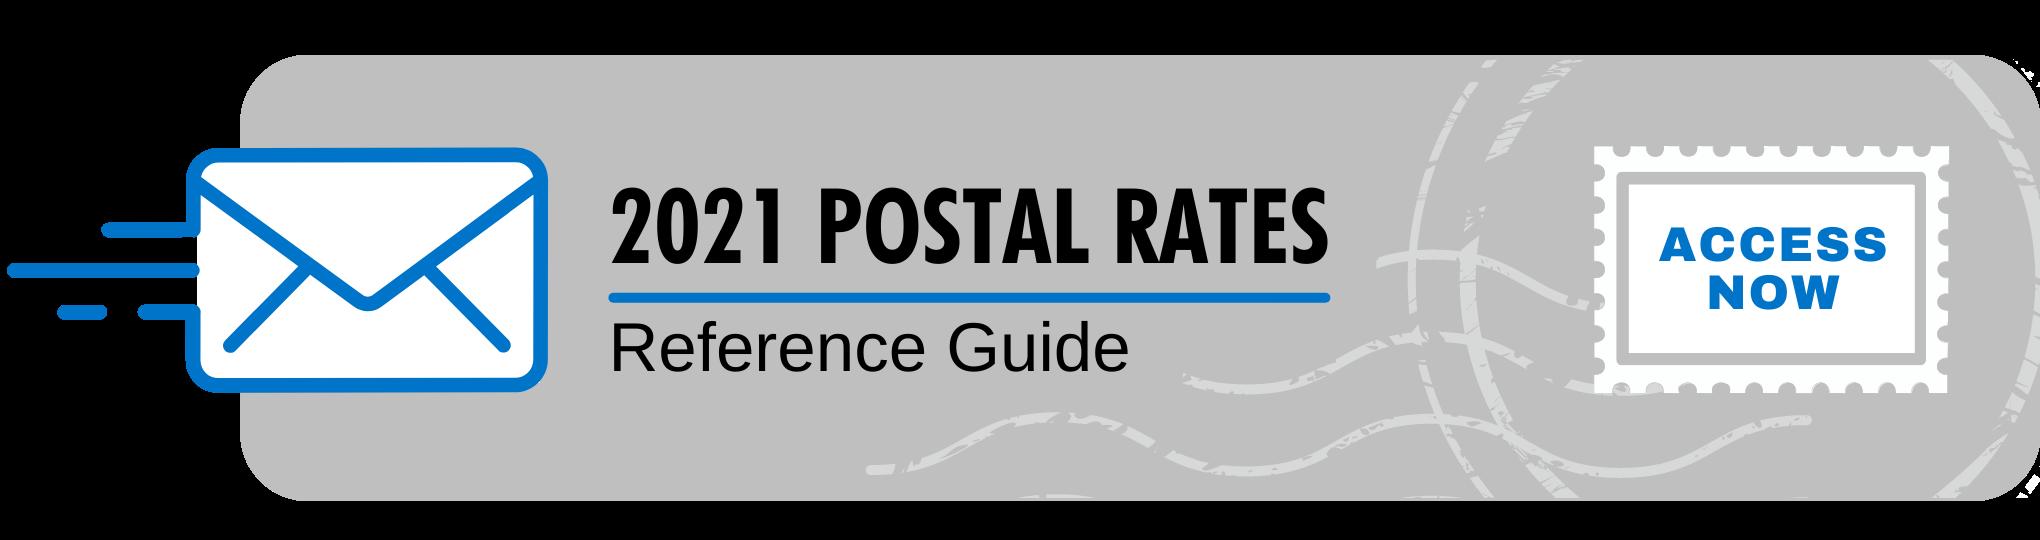 UnitedGMG - 2021 Postal rates